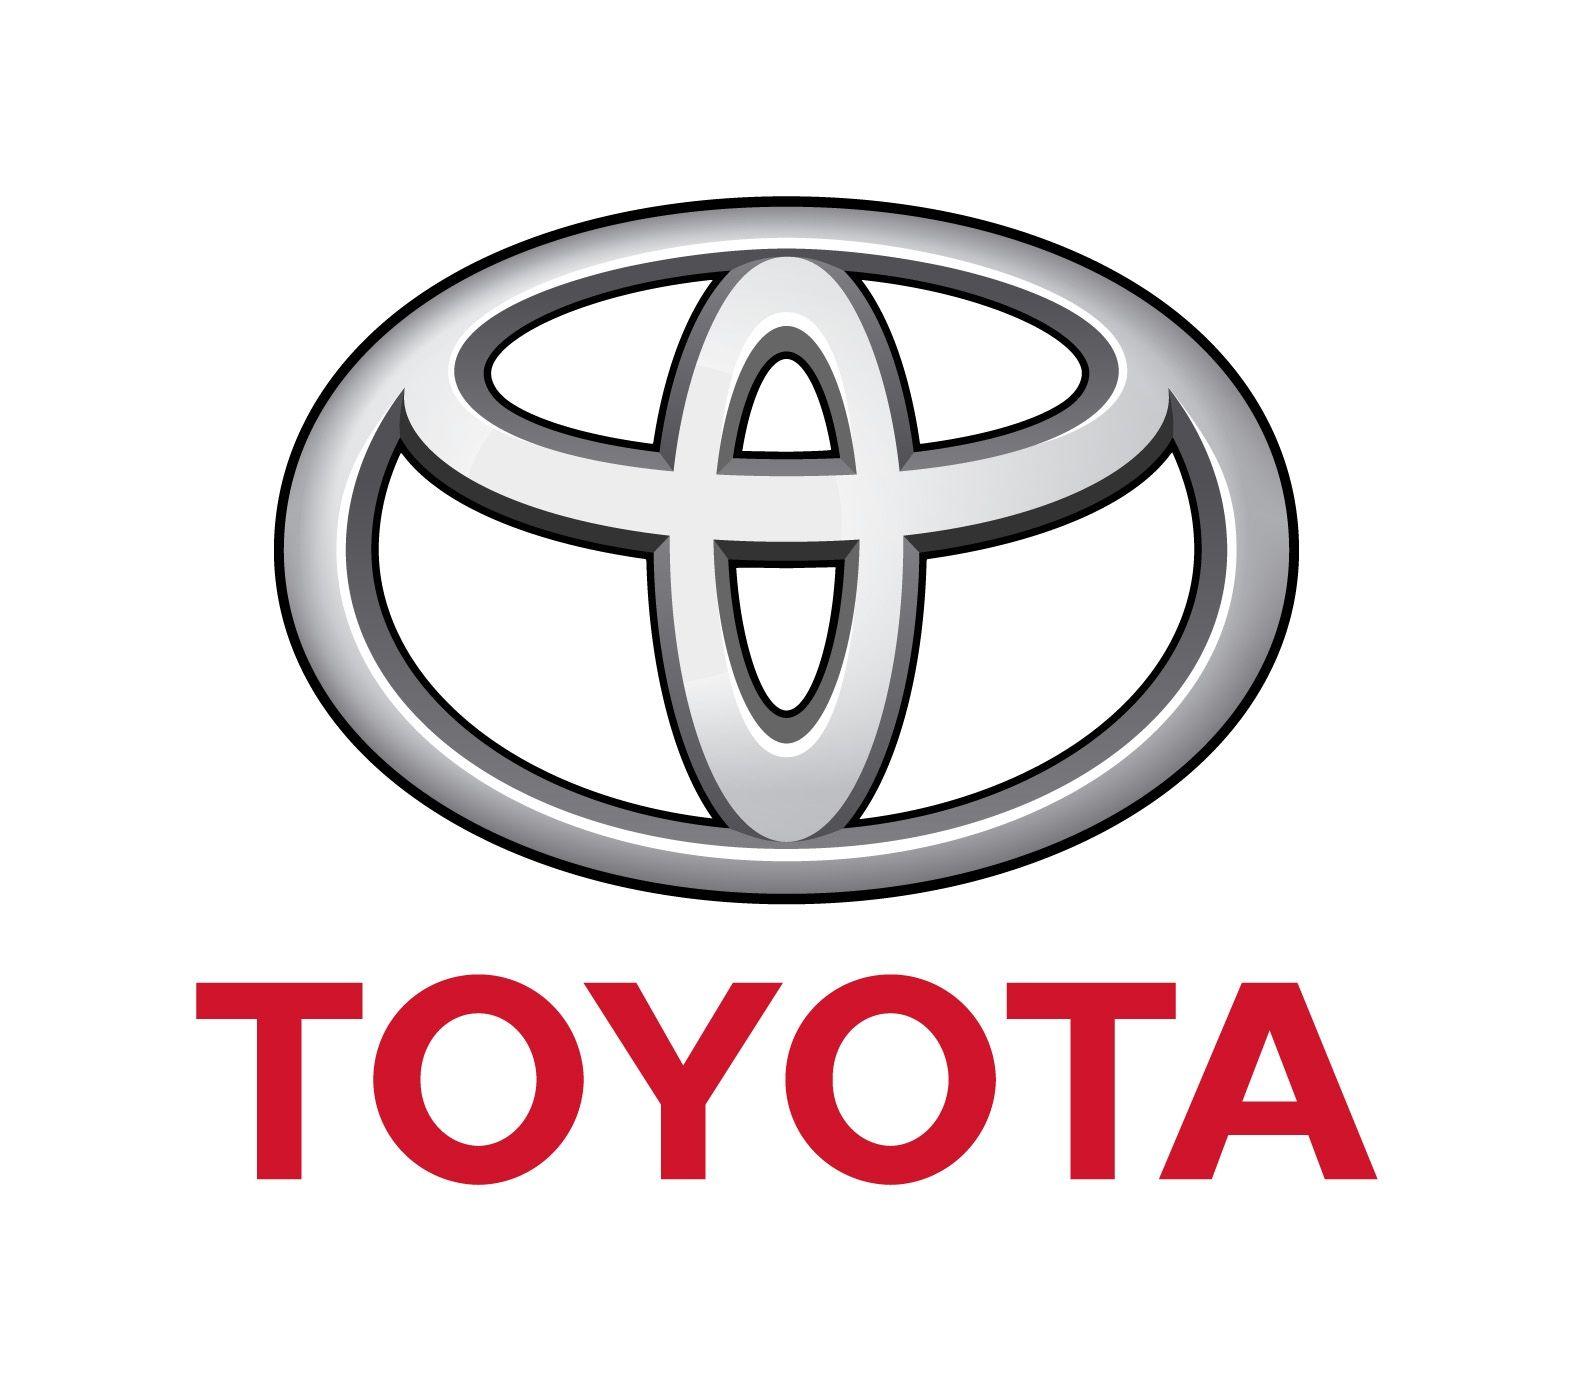 toyota logo slae1025 spring14 section 01 pinterest toyota rh pinterest com Toyota Tundra Logo Wallpaper toyota tundra logo font